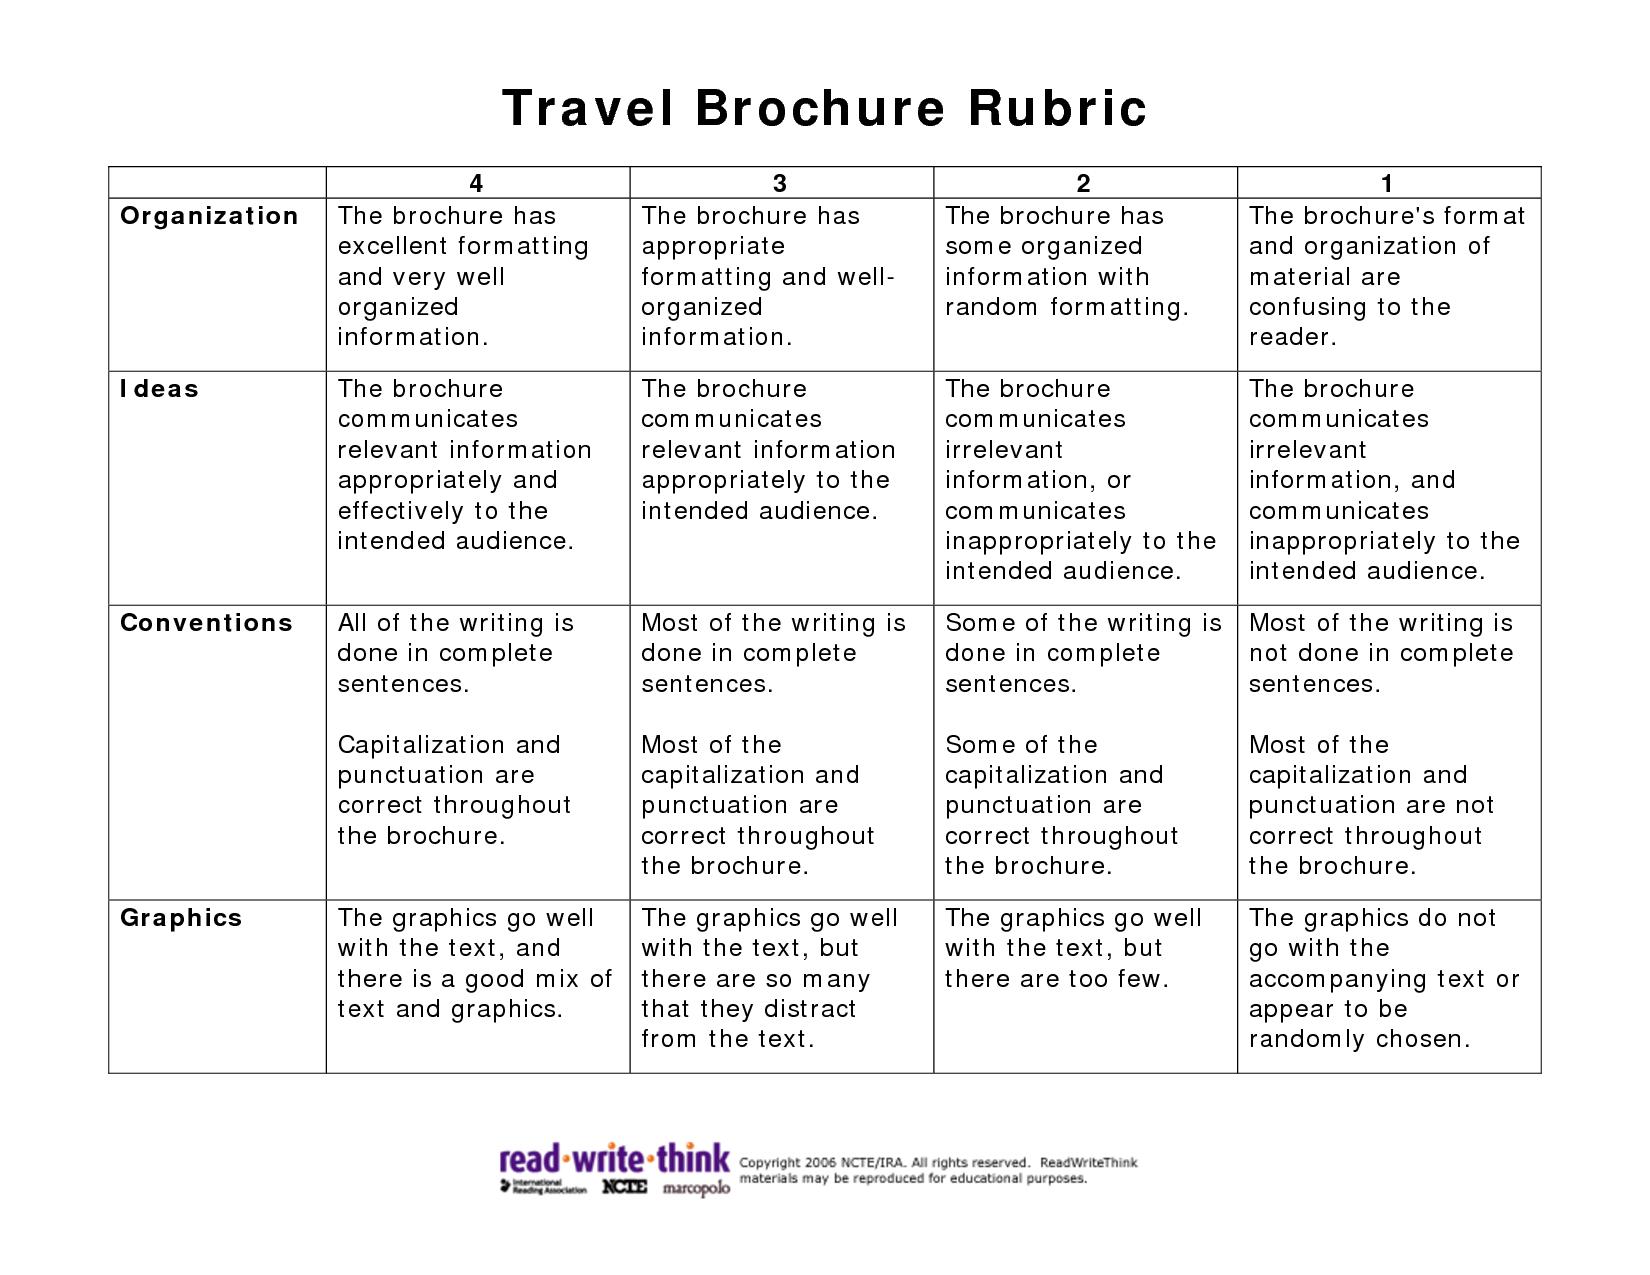 Travel Brochure Rubric | Social Studies | Rubrics, Social Within Brochure Rubric Template